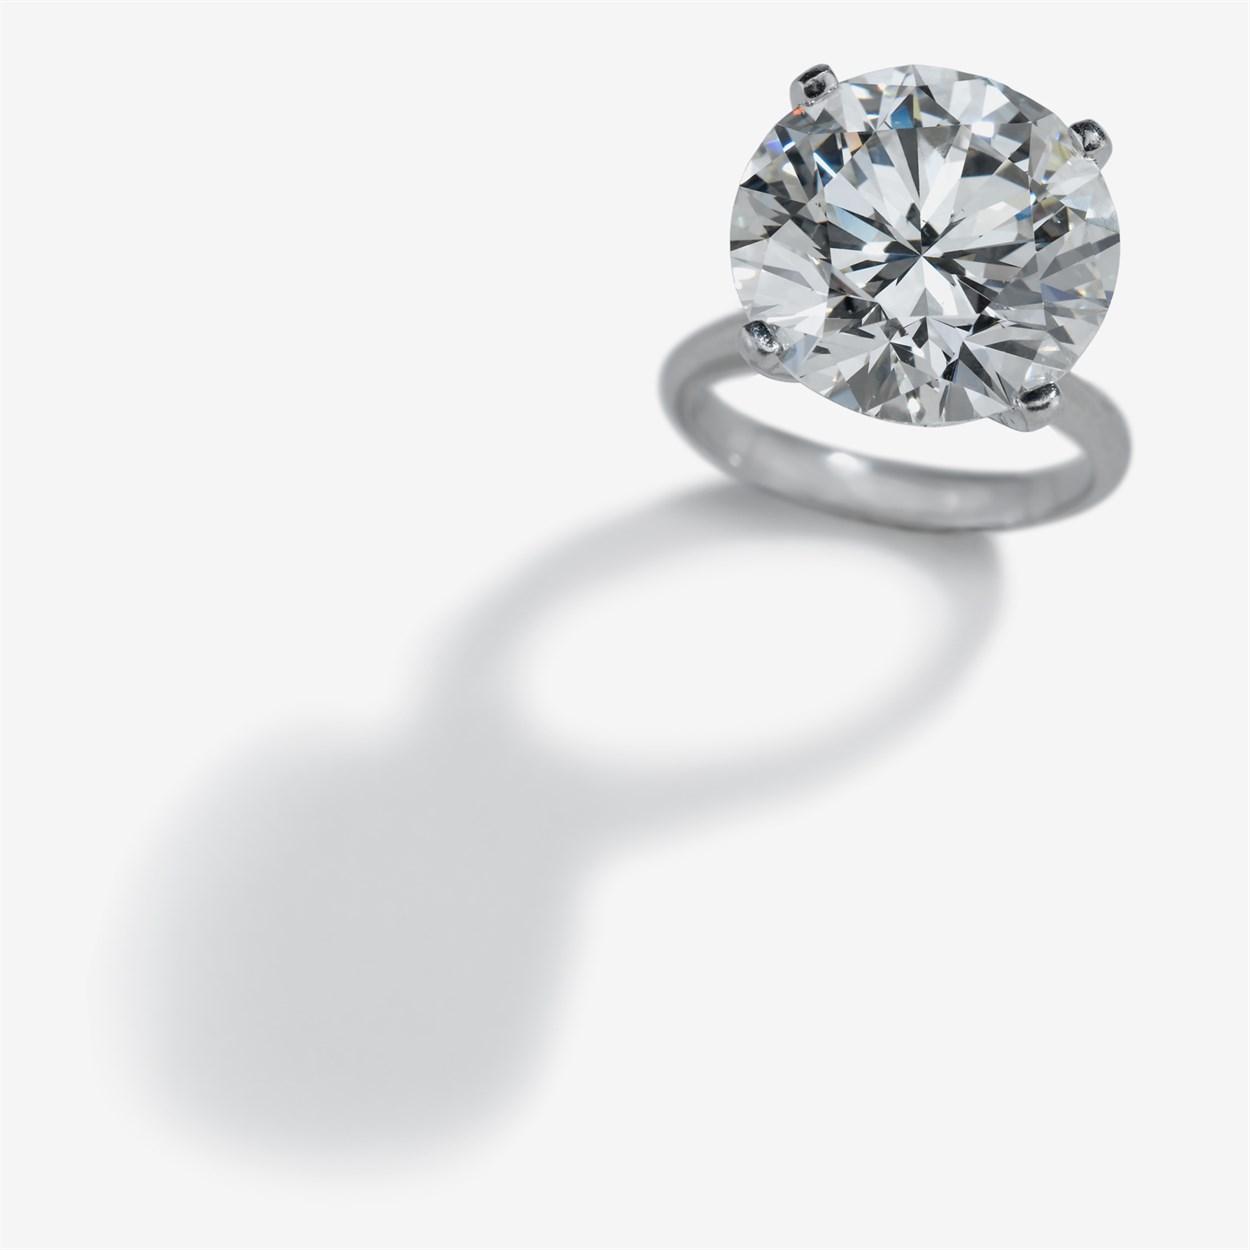 Lot 191 - An impressive diamond and platinum ring